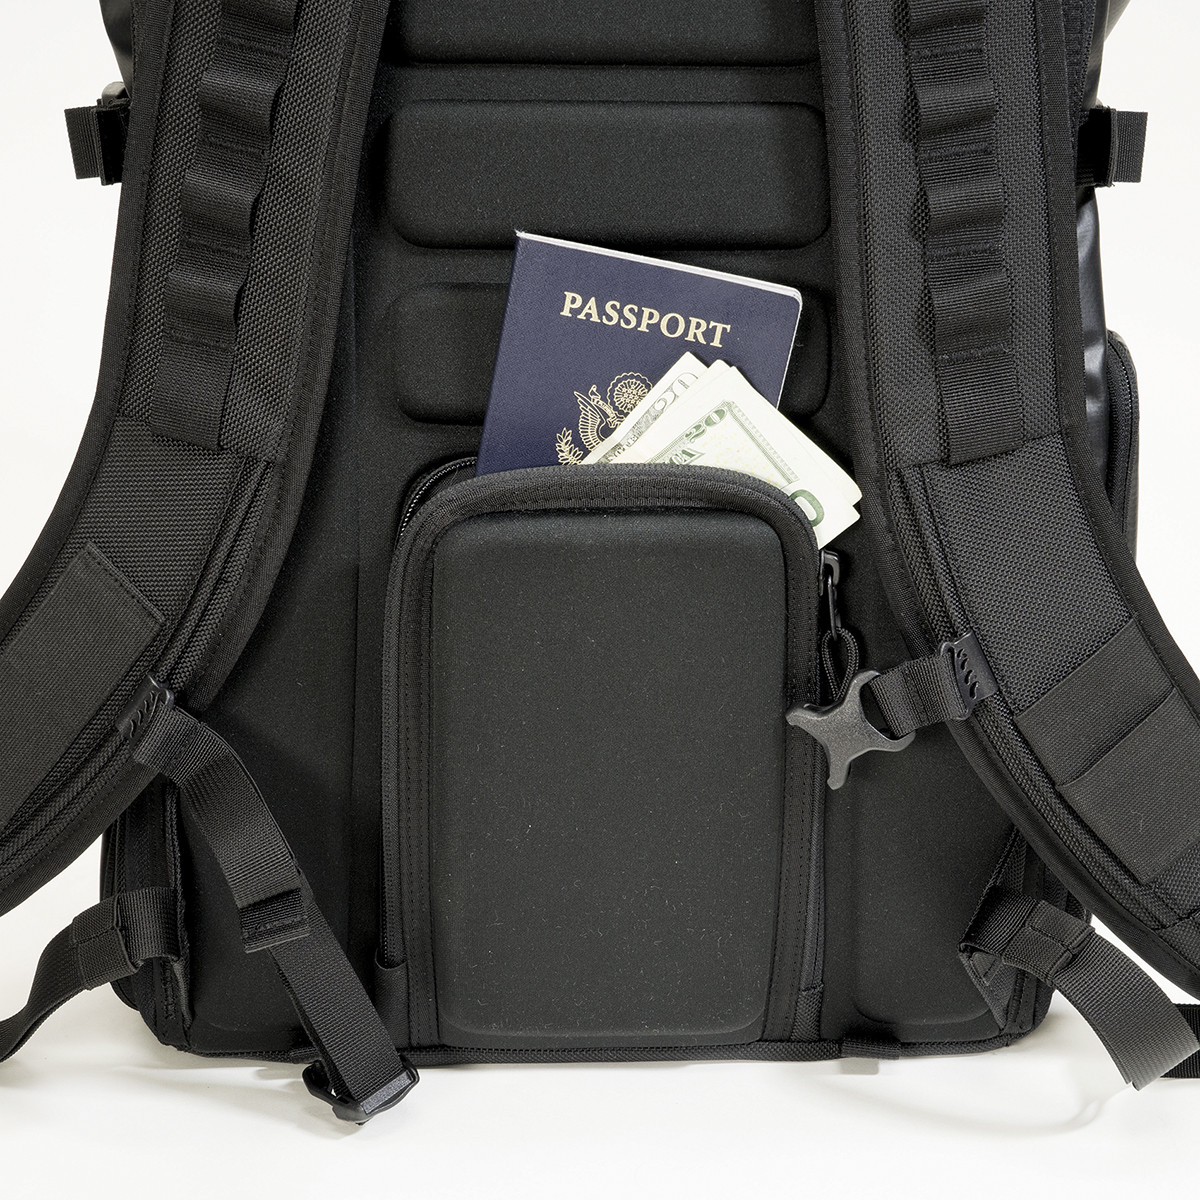 Passport_Pocket_Square_fc149172-da1a-4438-9aba-ec0356ccae32